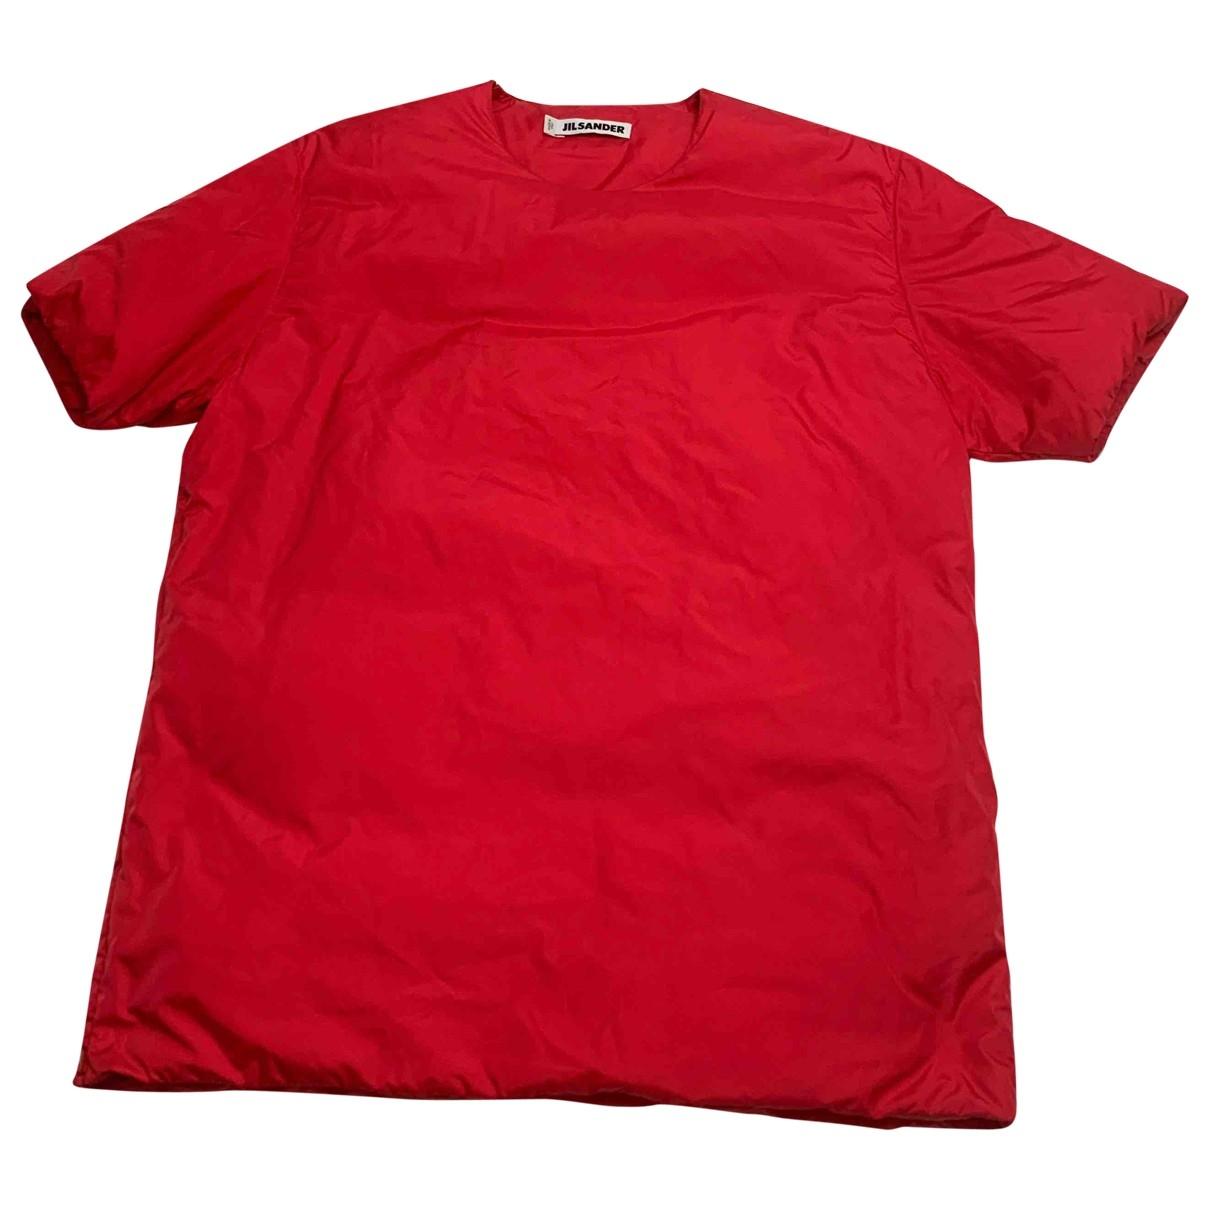 Jil Sander - Tee shirts   pour homme - rouge